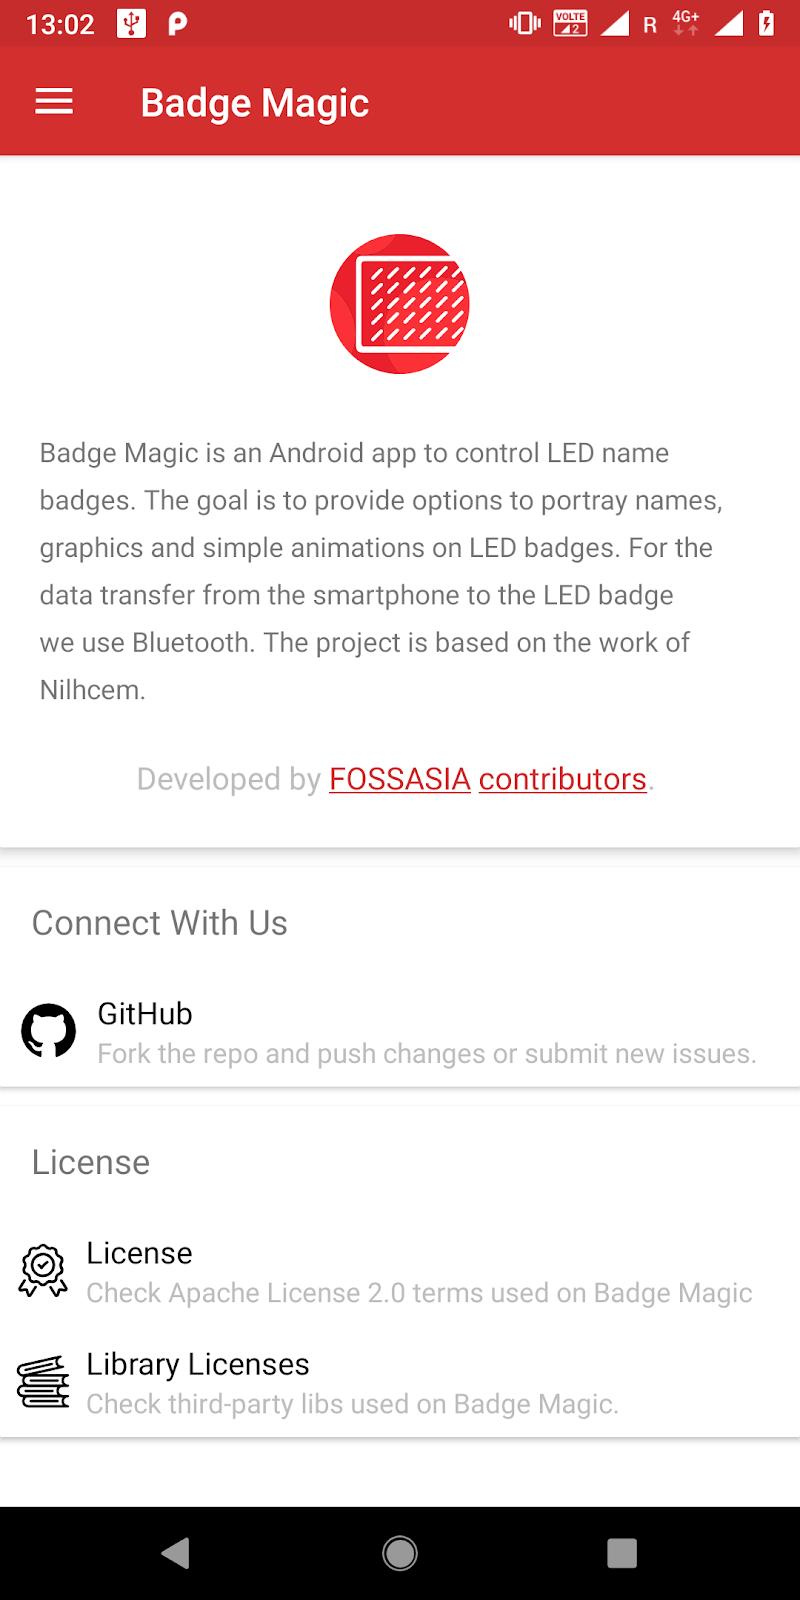 FOSSASIA Open Tech Community